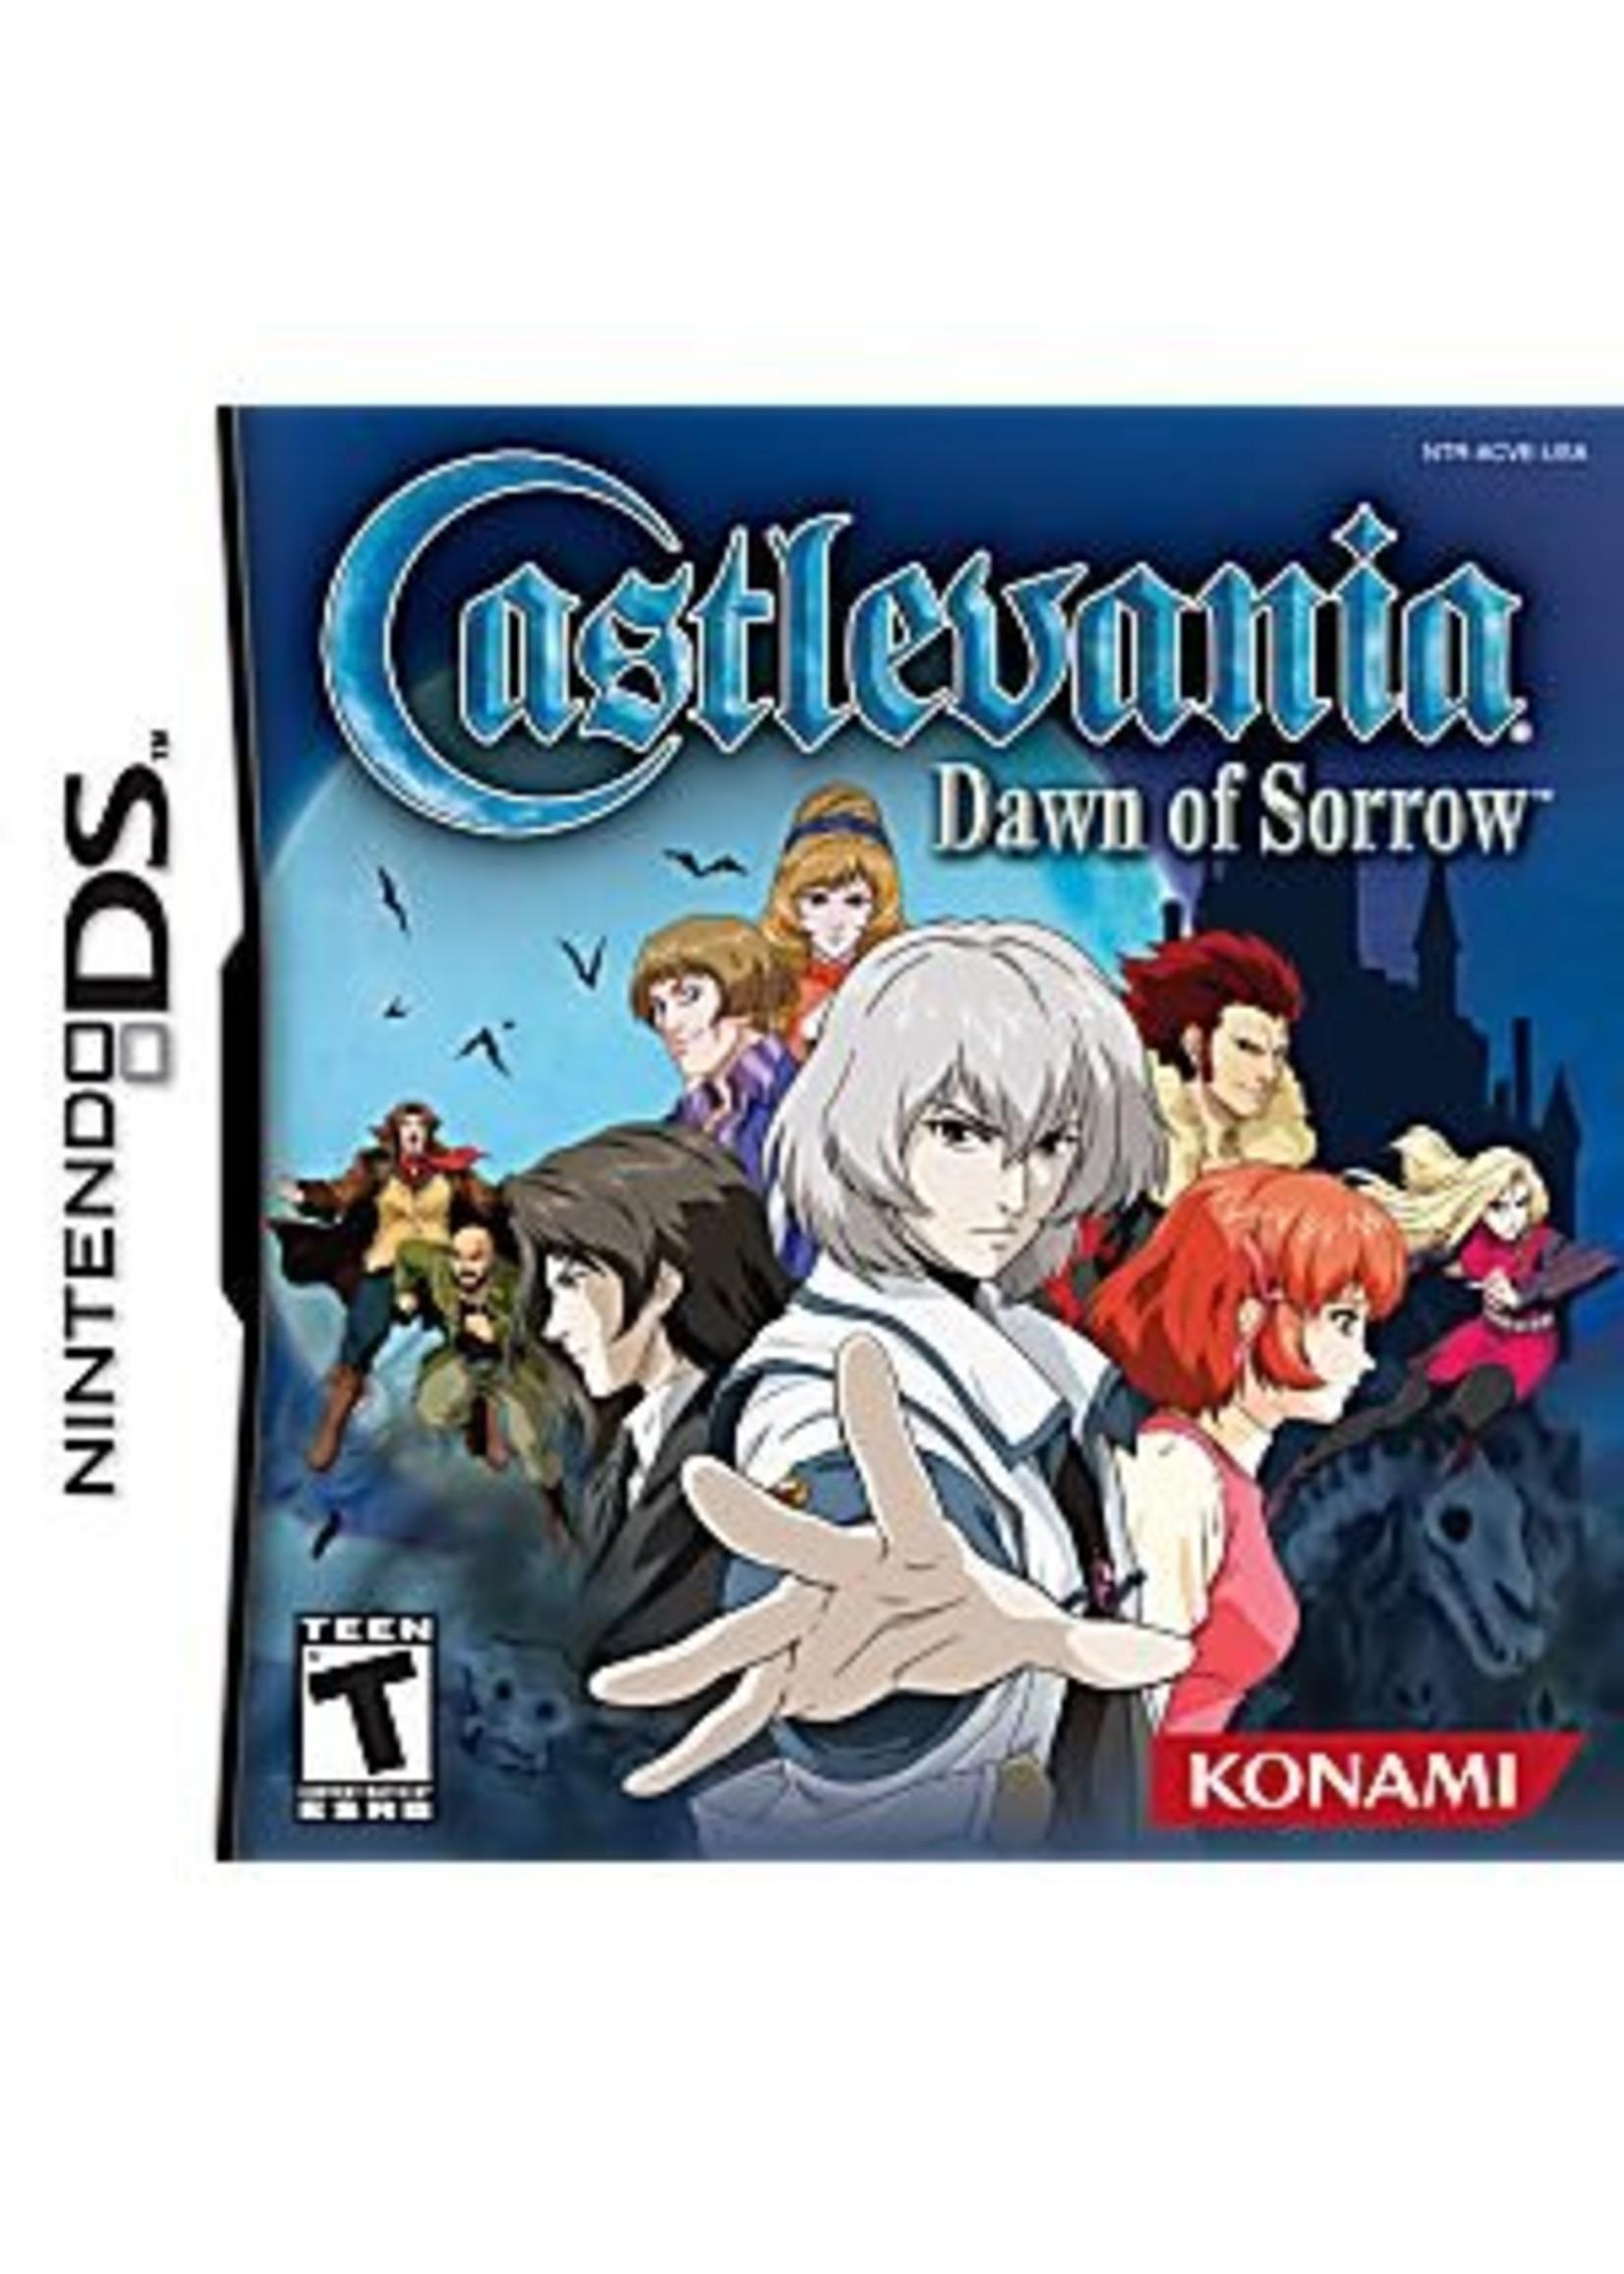 Castlevania: Dawn of Sorrow - NDS PrePlayed